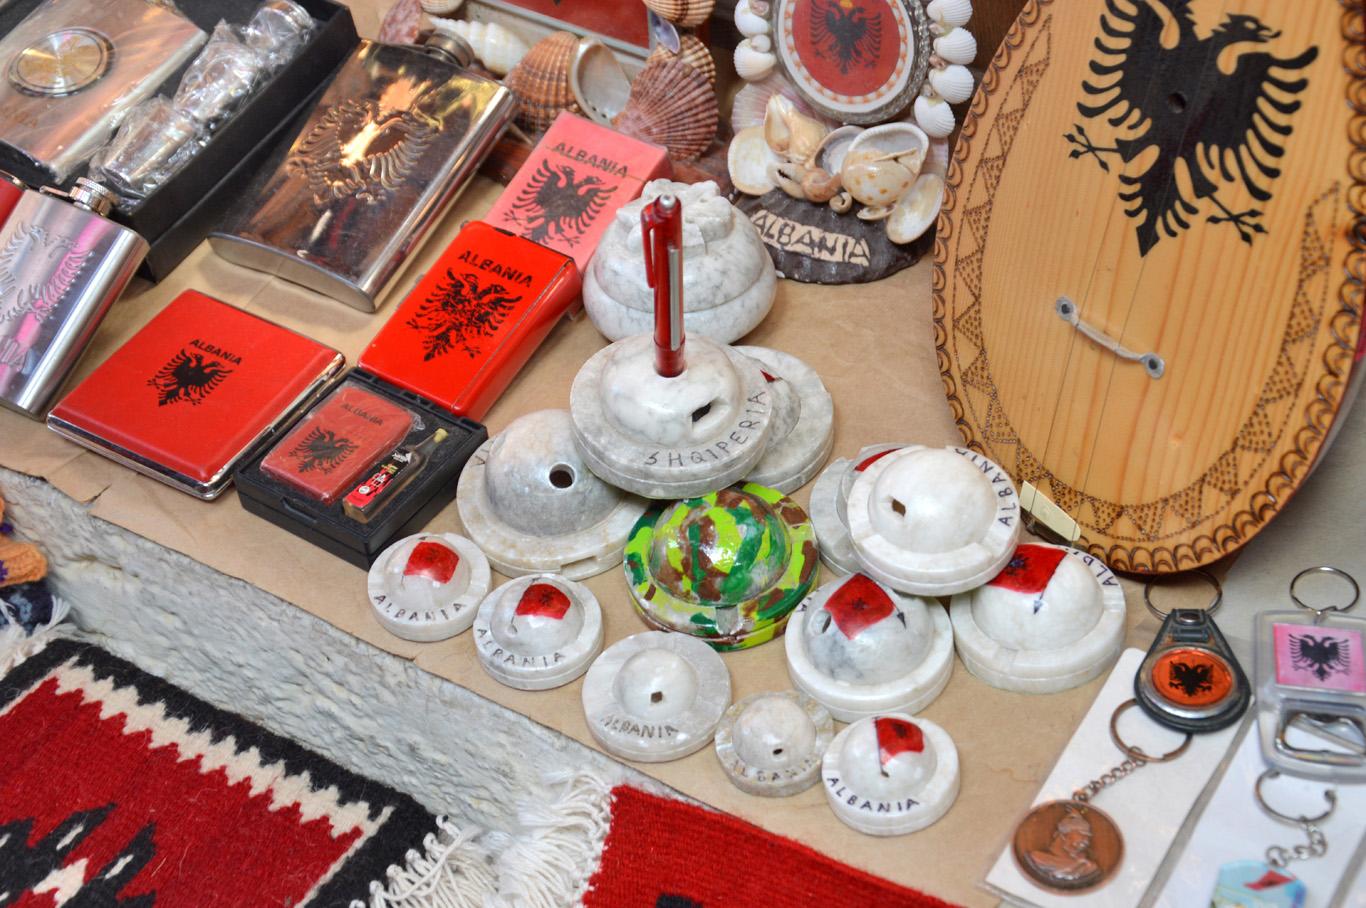 Albanian souvenirs